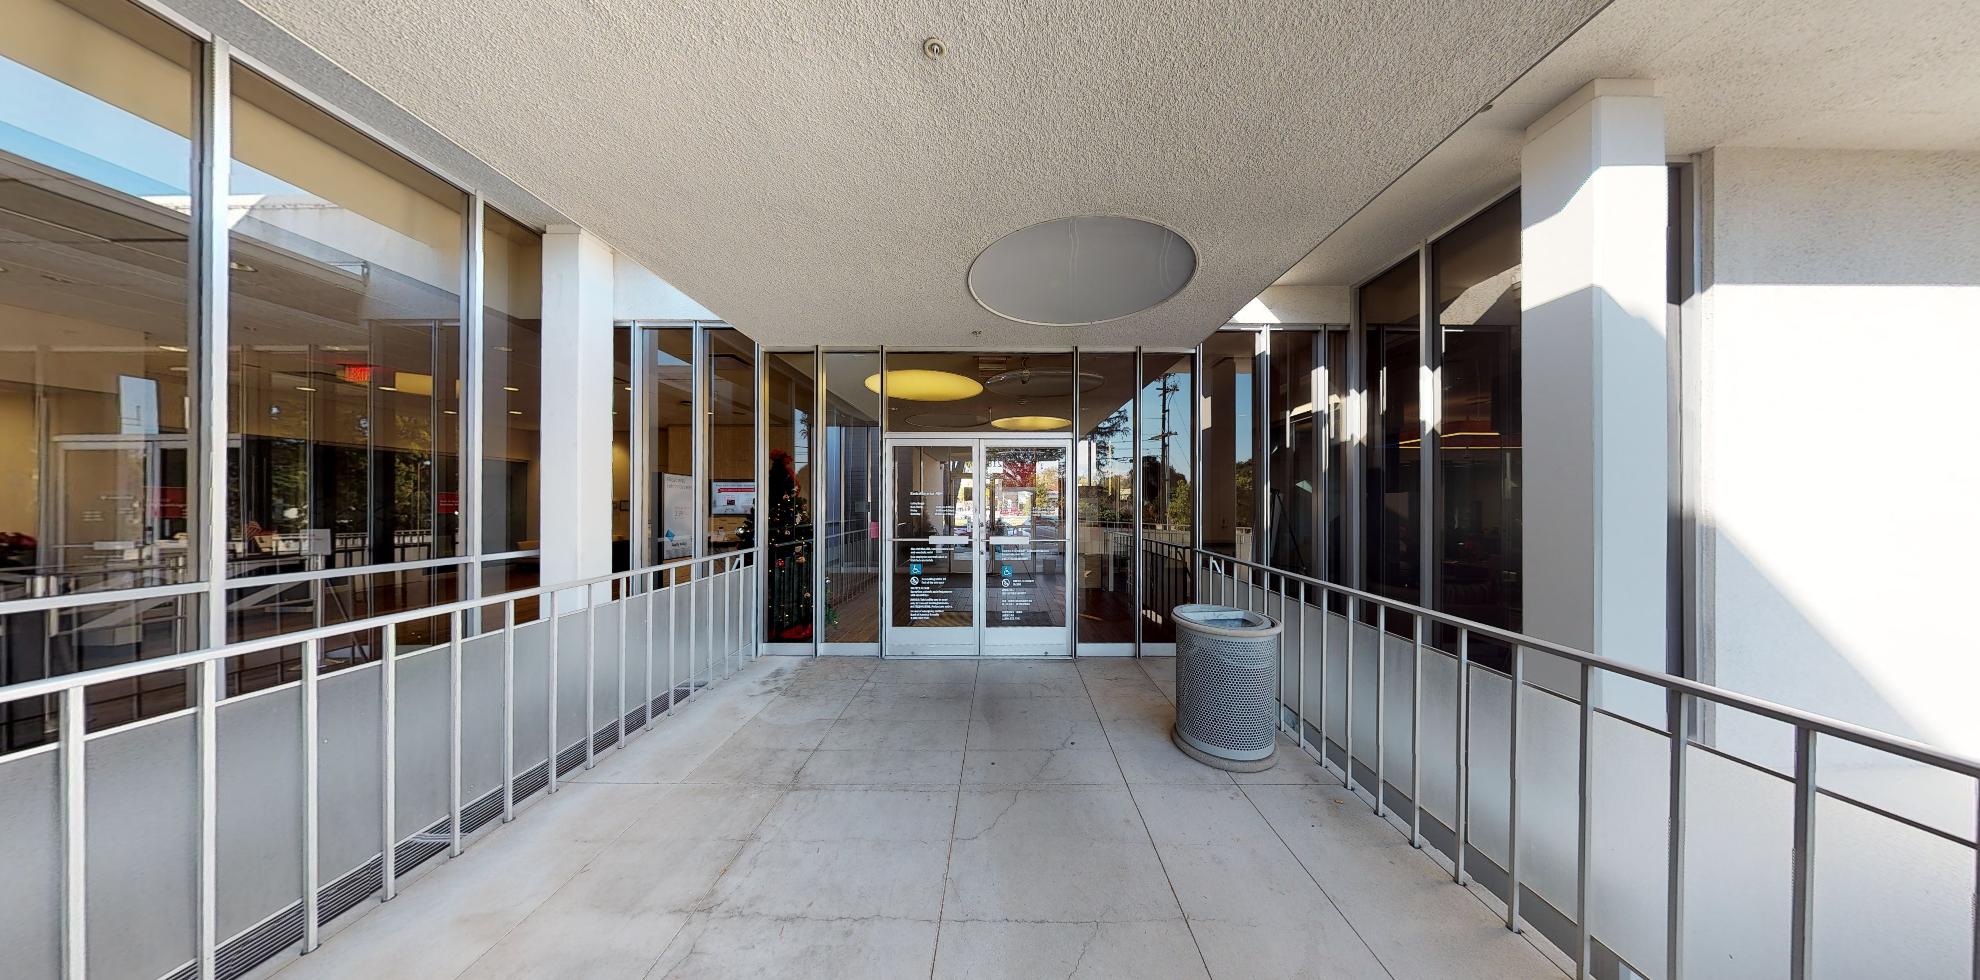 Bank of America financial center with walk-up ATM | 2180 Huntington Dr, San Marino, CA 91108